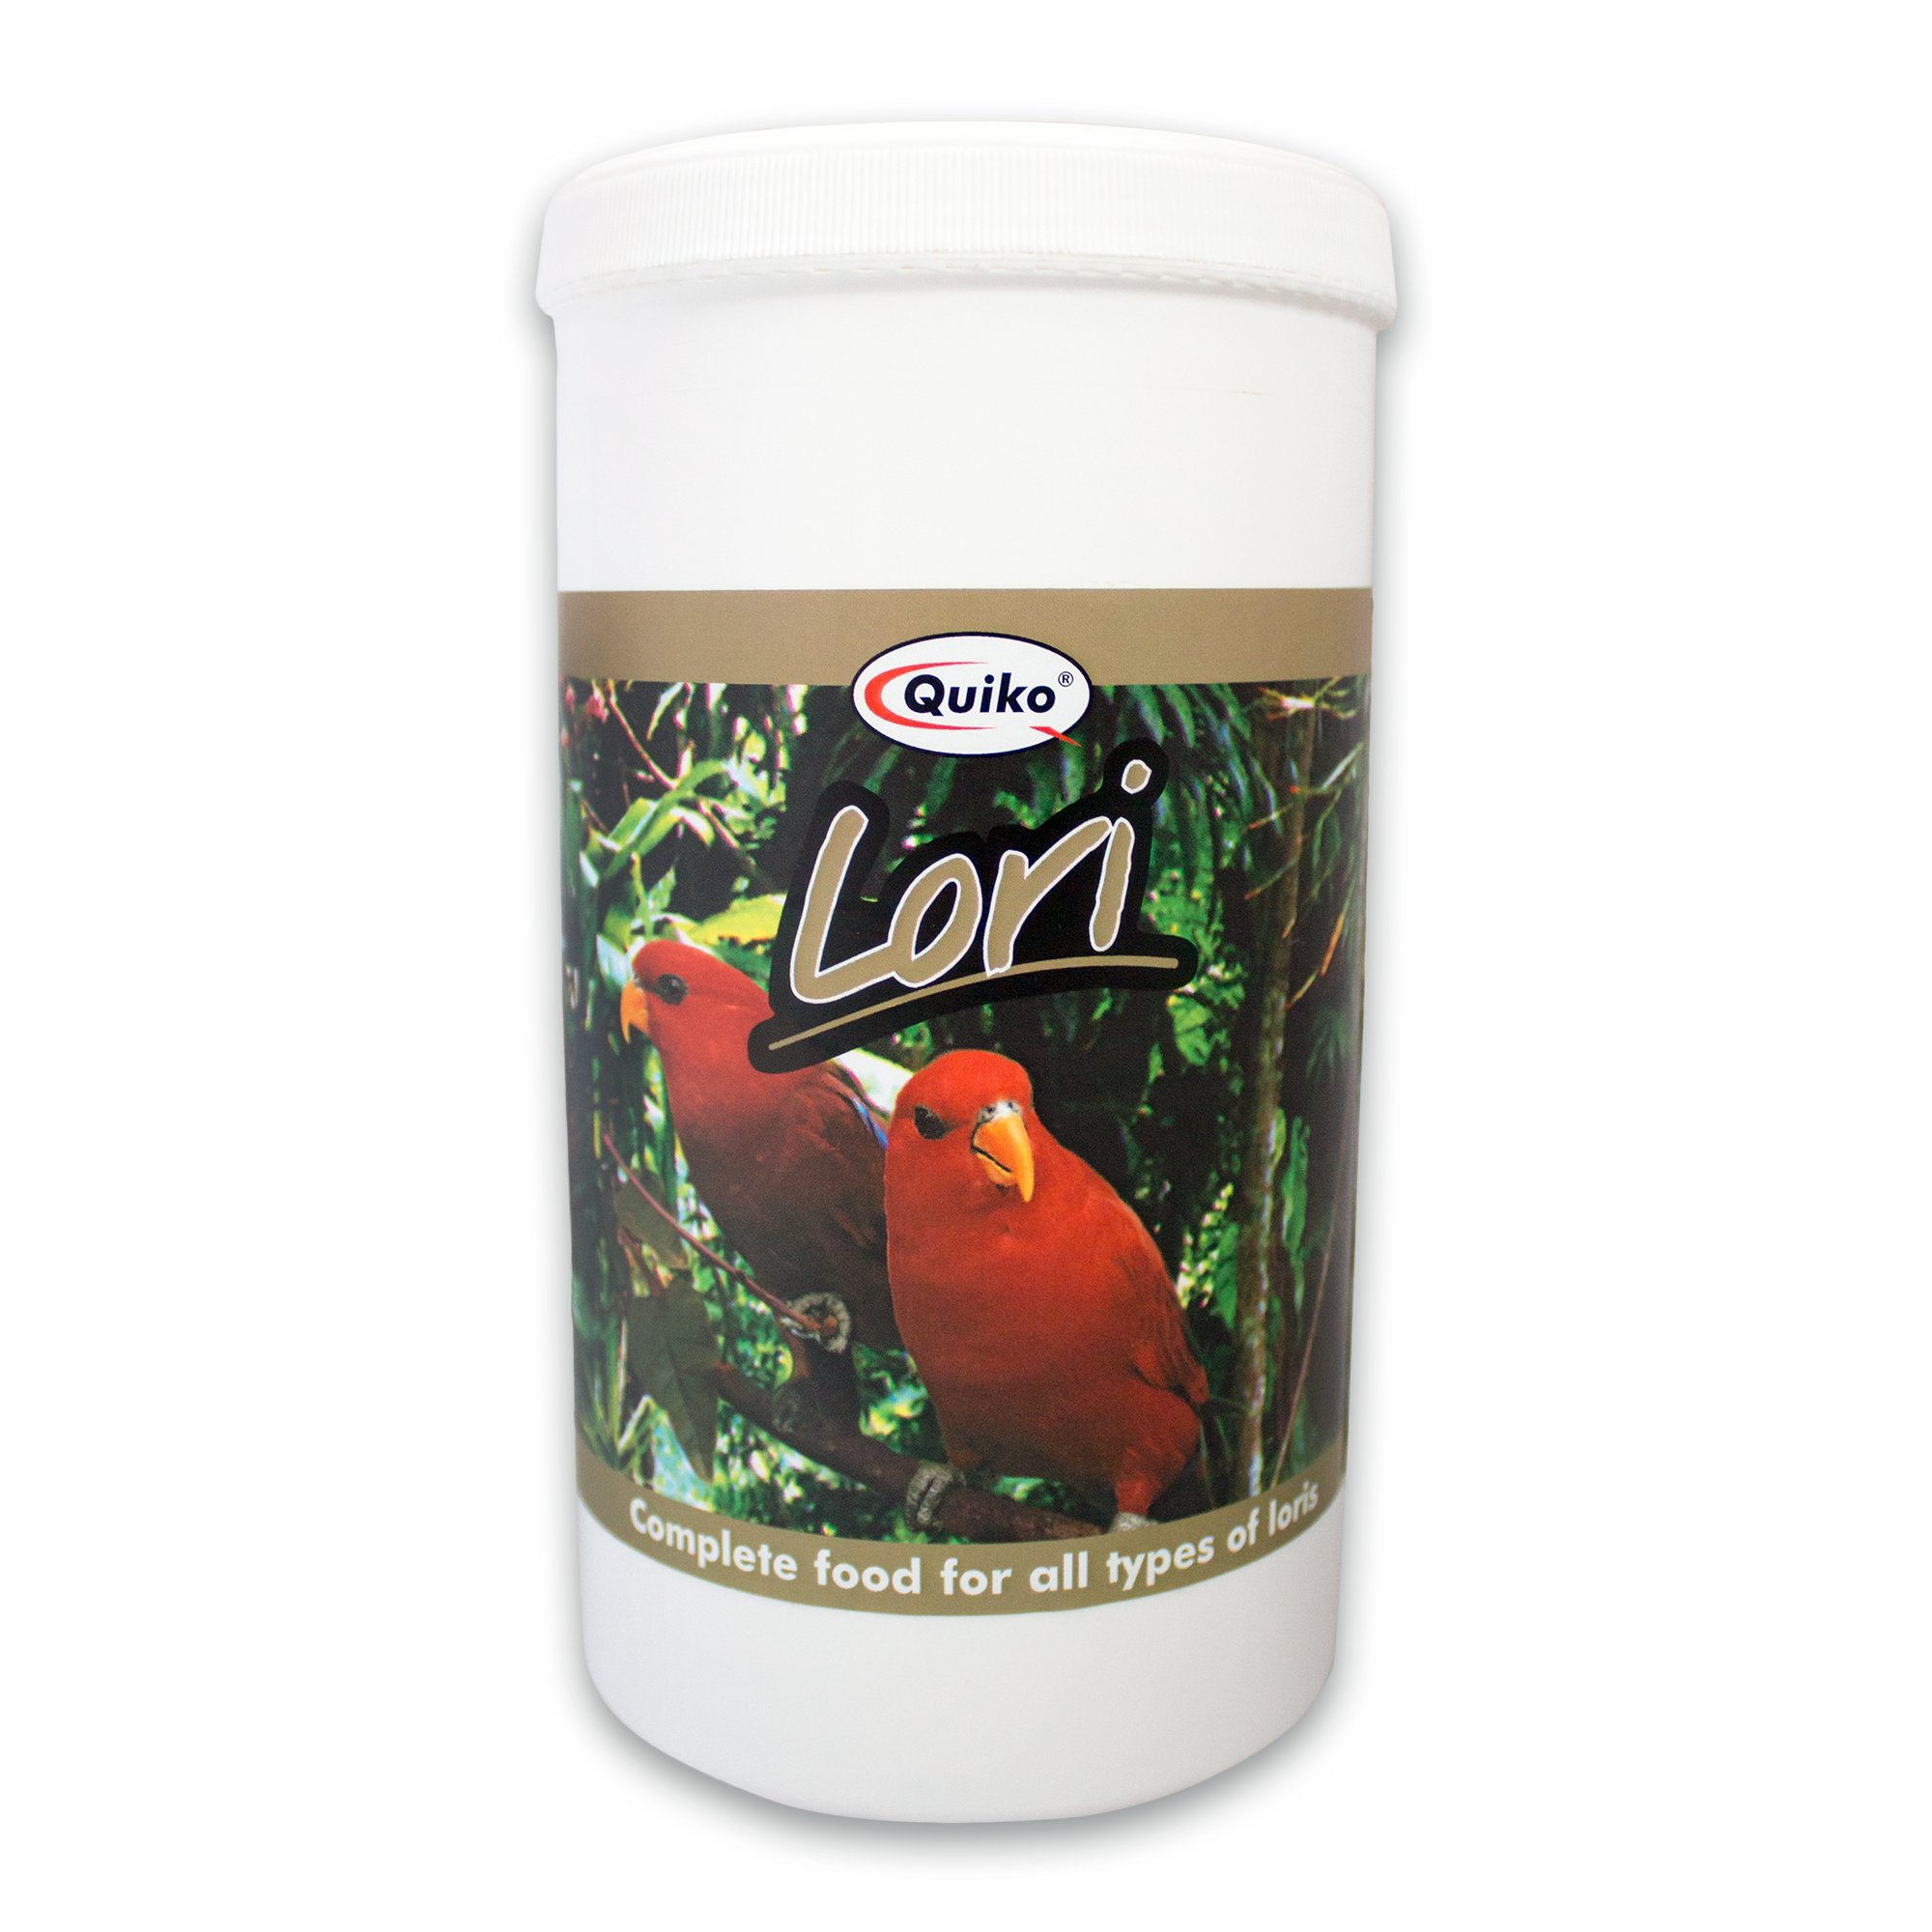 Quiko Lori Bird Food